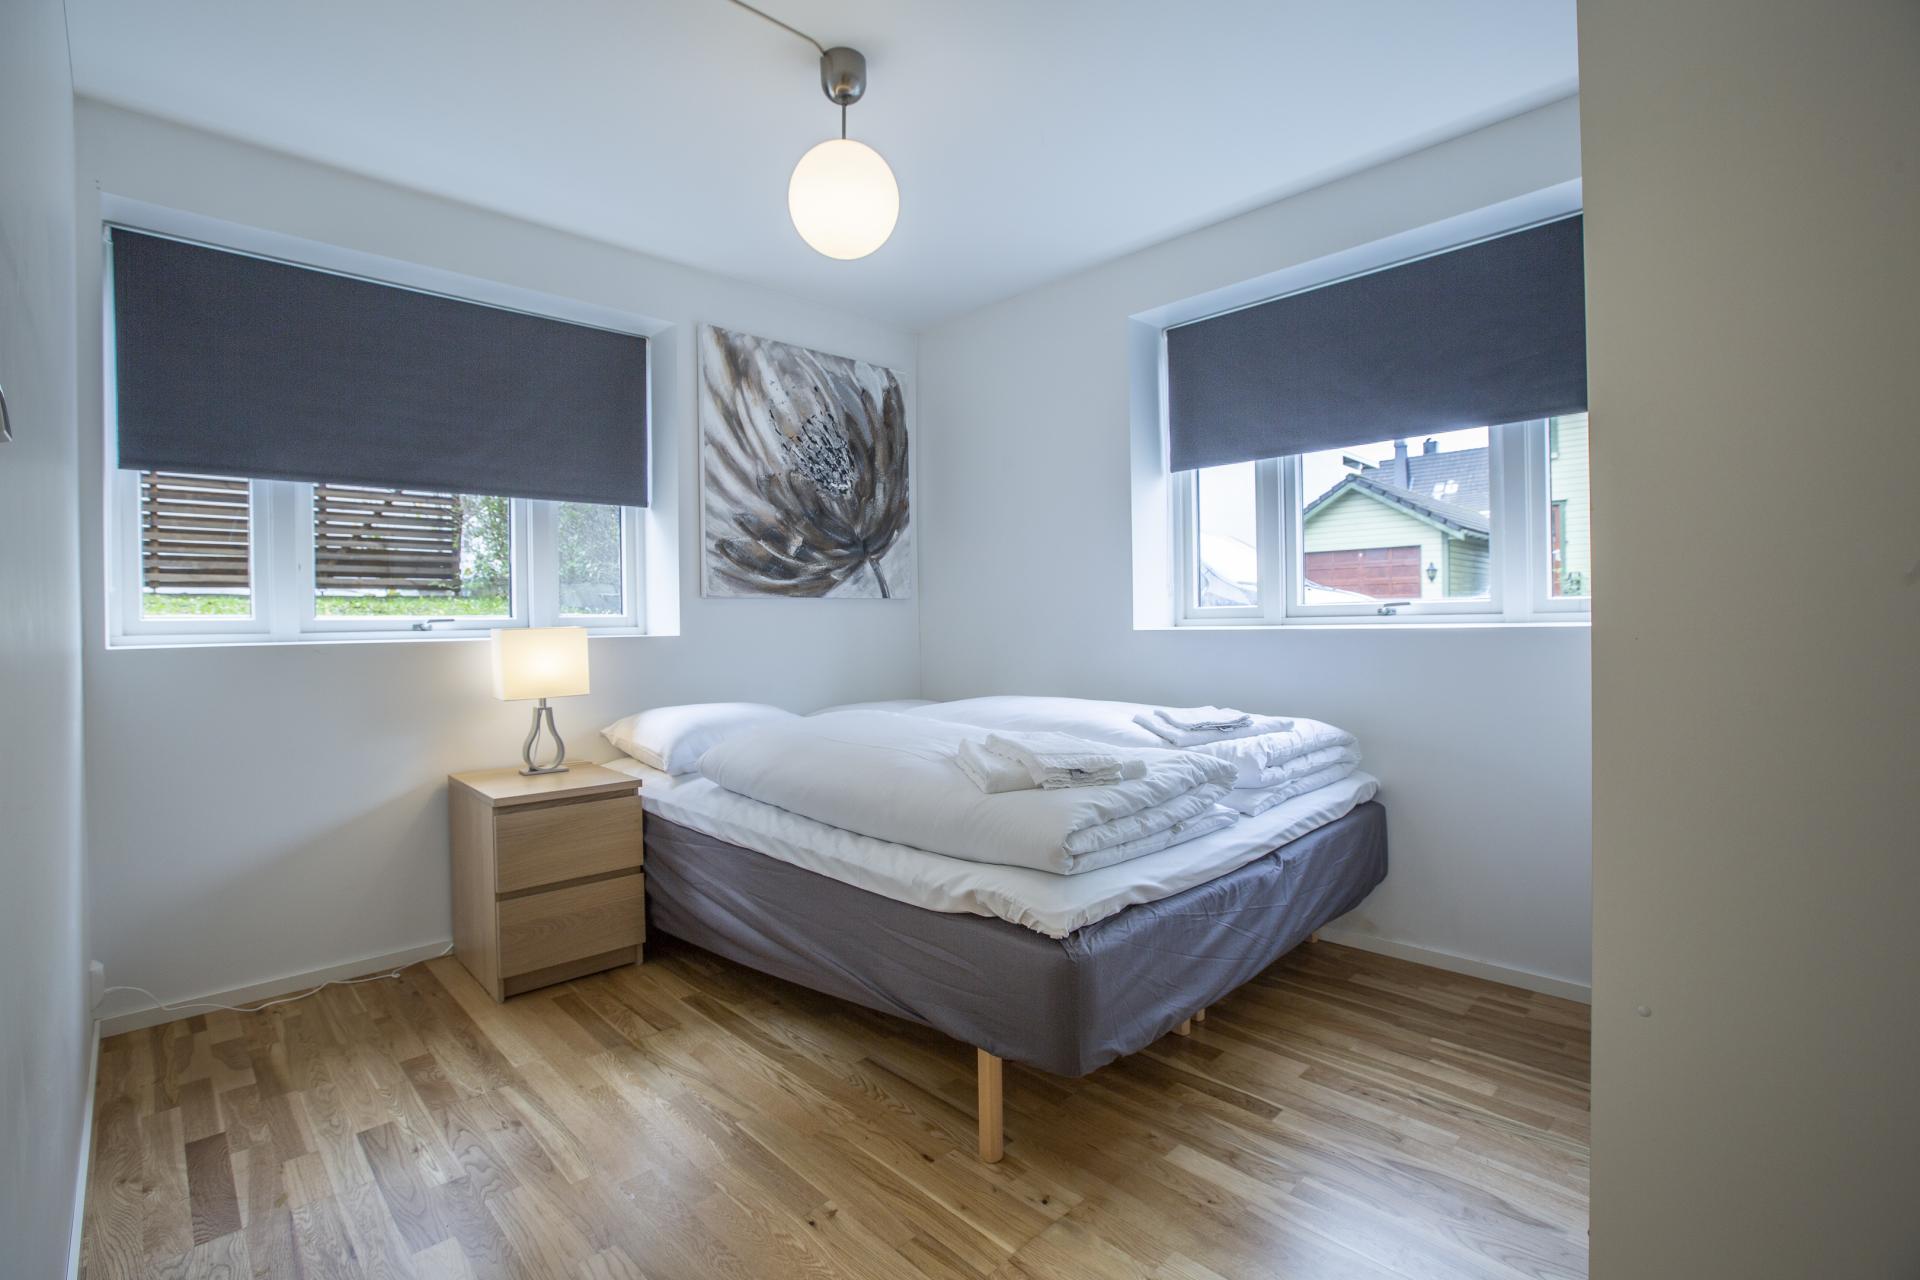 Bed at Saudagata 9 Apartment, Lagard, Stavanger